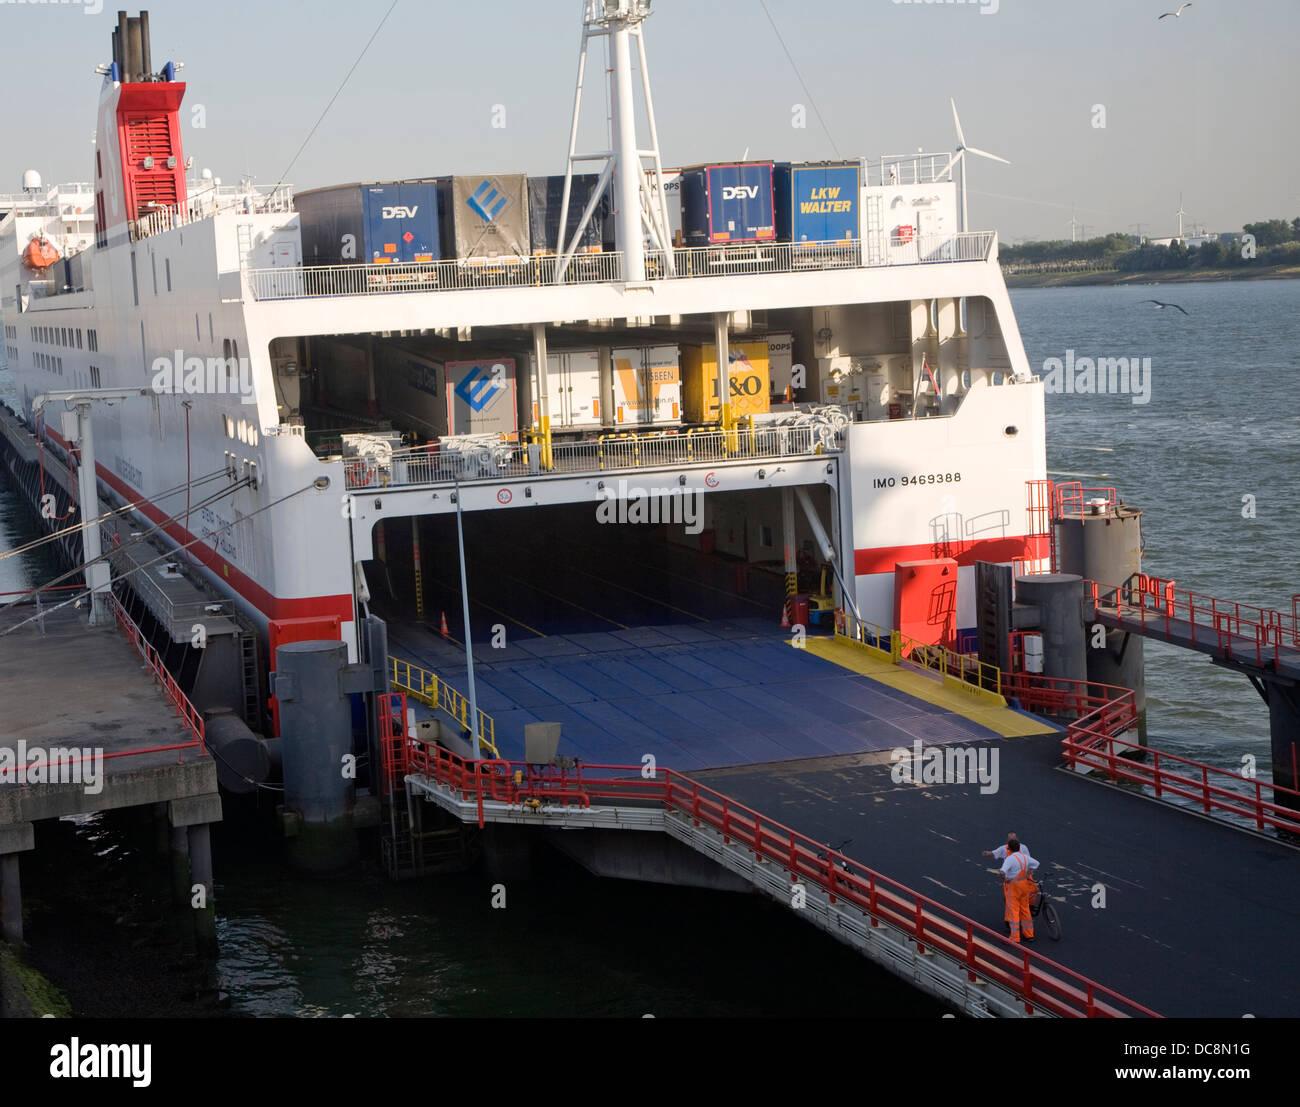 Ro-ro vehicle freight ferry Hoek van Holland Netherlands - Stock Image